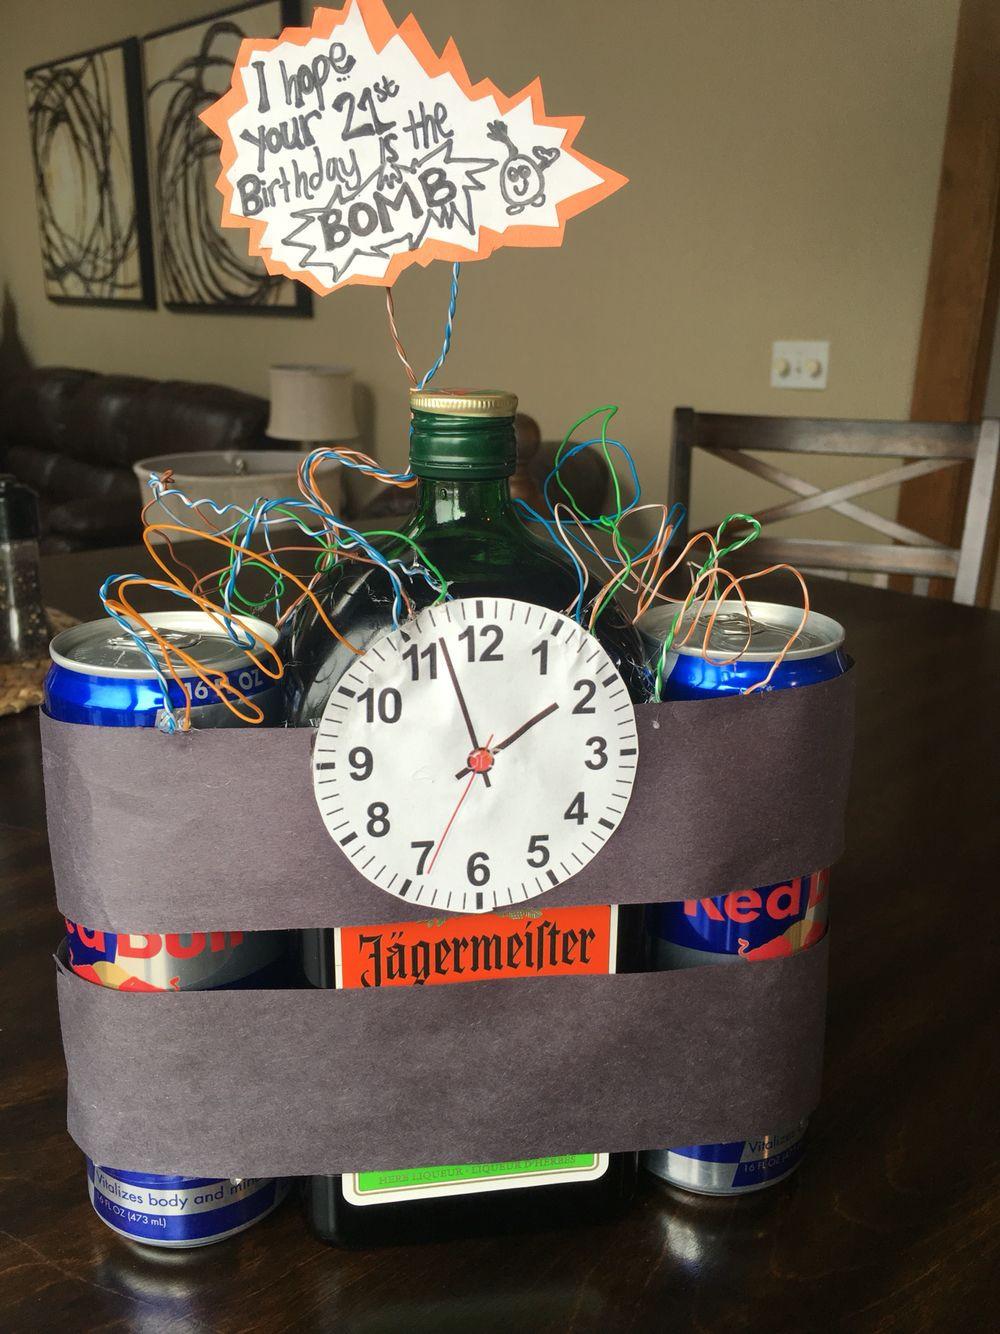 Best ideas about 21St Birthday Gift Ideas . Save or Pin Boyfriends 21st birthday idea Jäger s Creative Now.